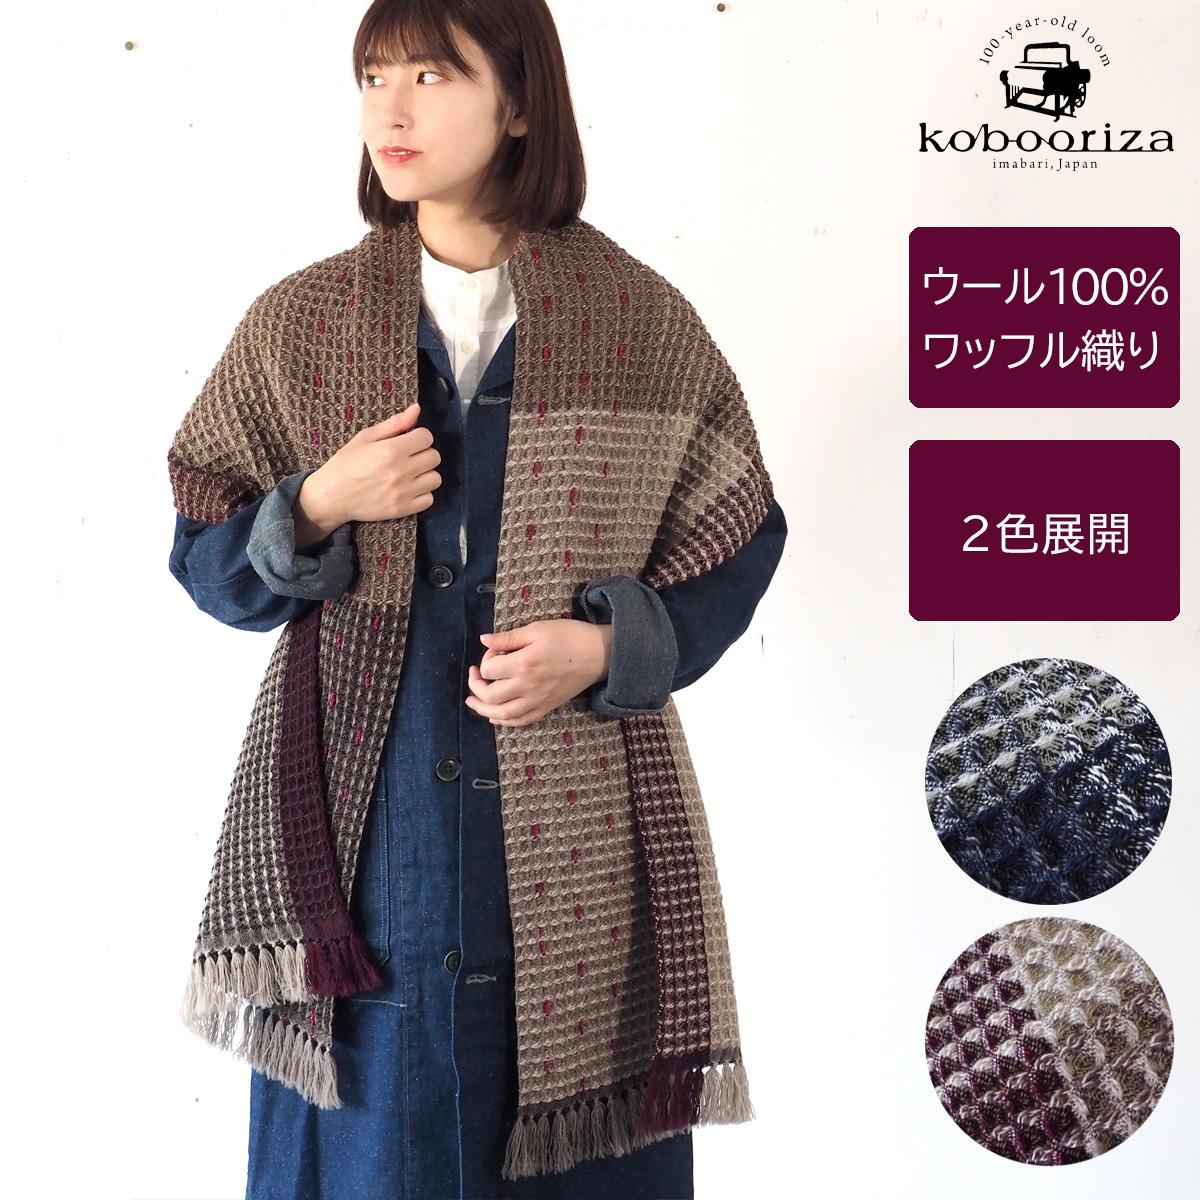 kobooriza−工房織座− ウール100% 刺し子ドットマフラー メンズ・レディース [K-MF-KO02]